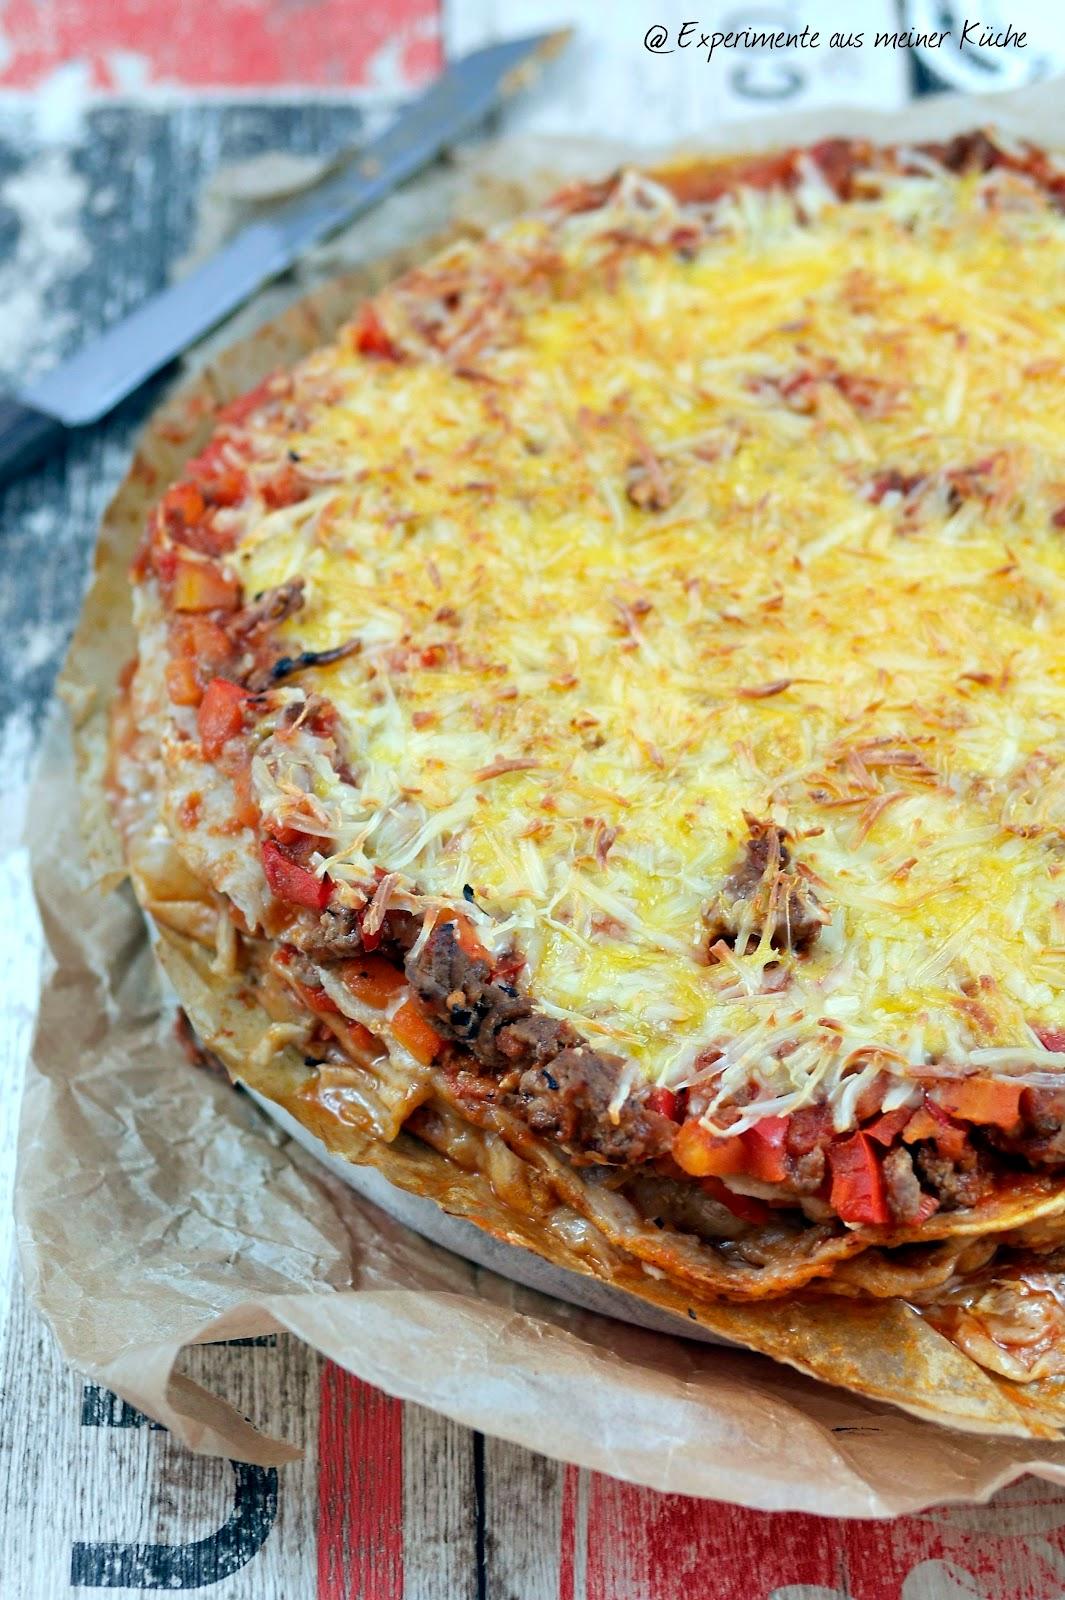 Communication on this topic: Tortilla Torte, tortilla-torte/